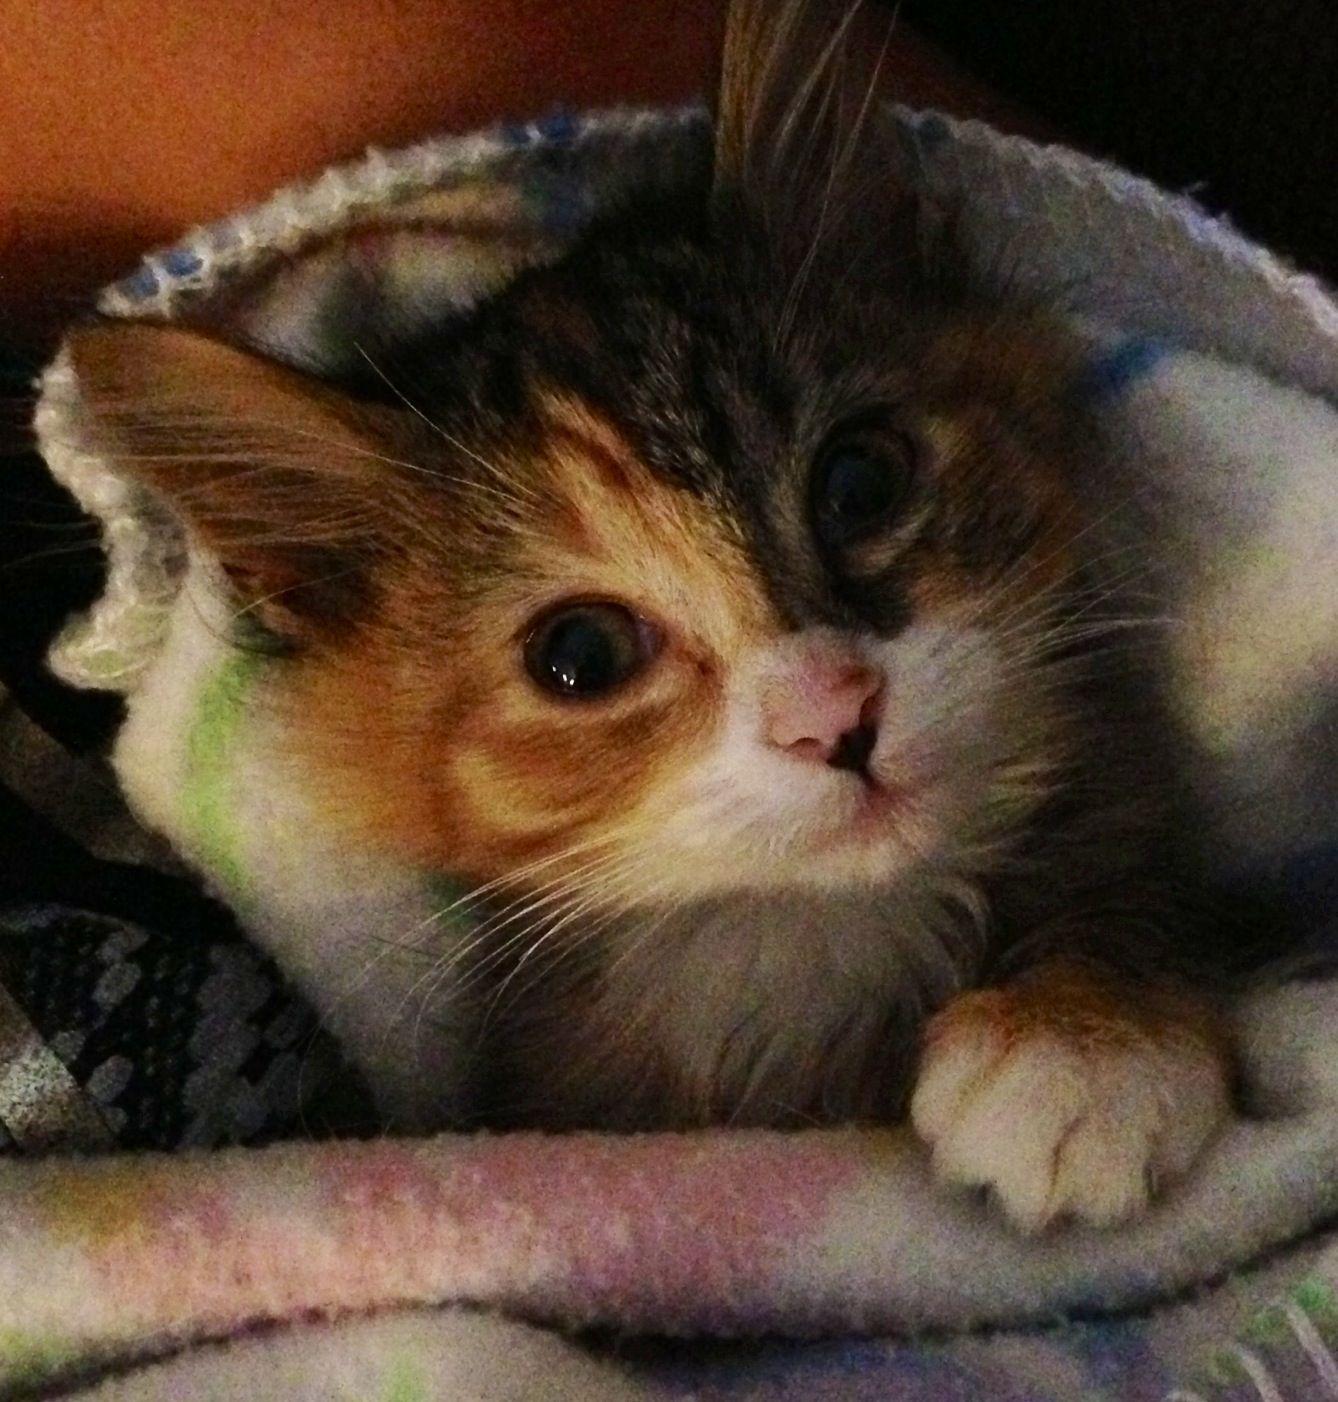 Cute Baby Kitten Kittens Cutest Baby Kittens Cutest Cute Funny Animals